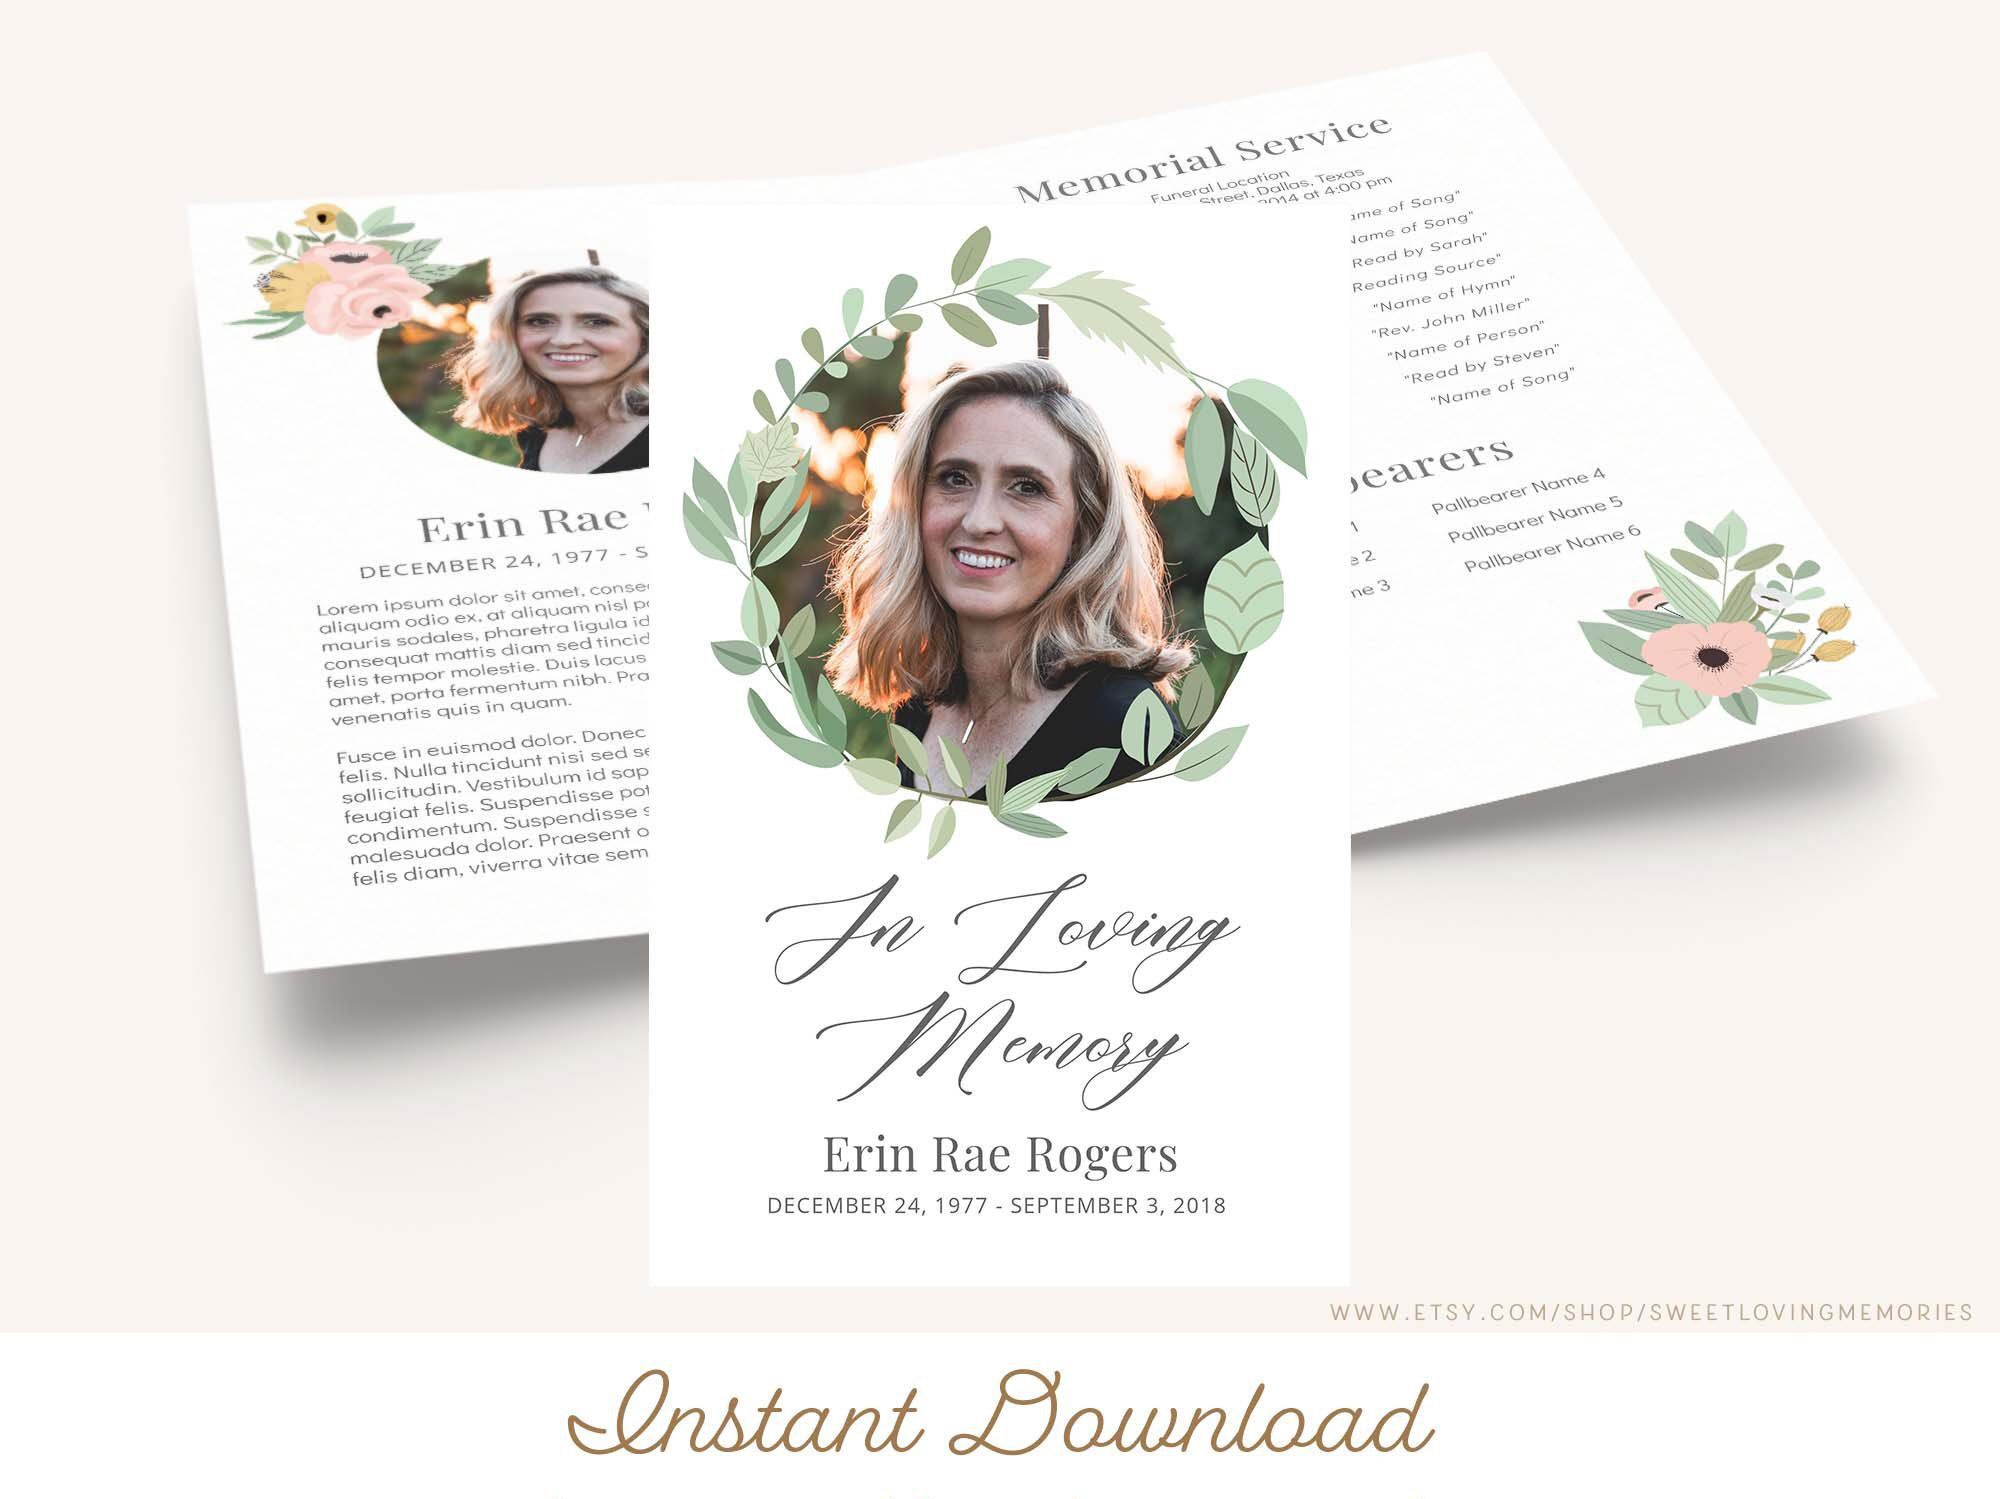 006 Wondrou Memorial Card Template Free Download Inspiration Full